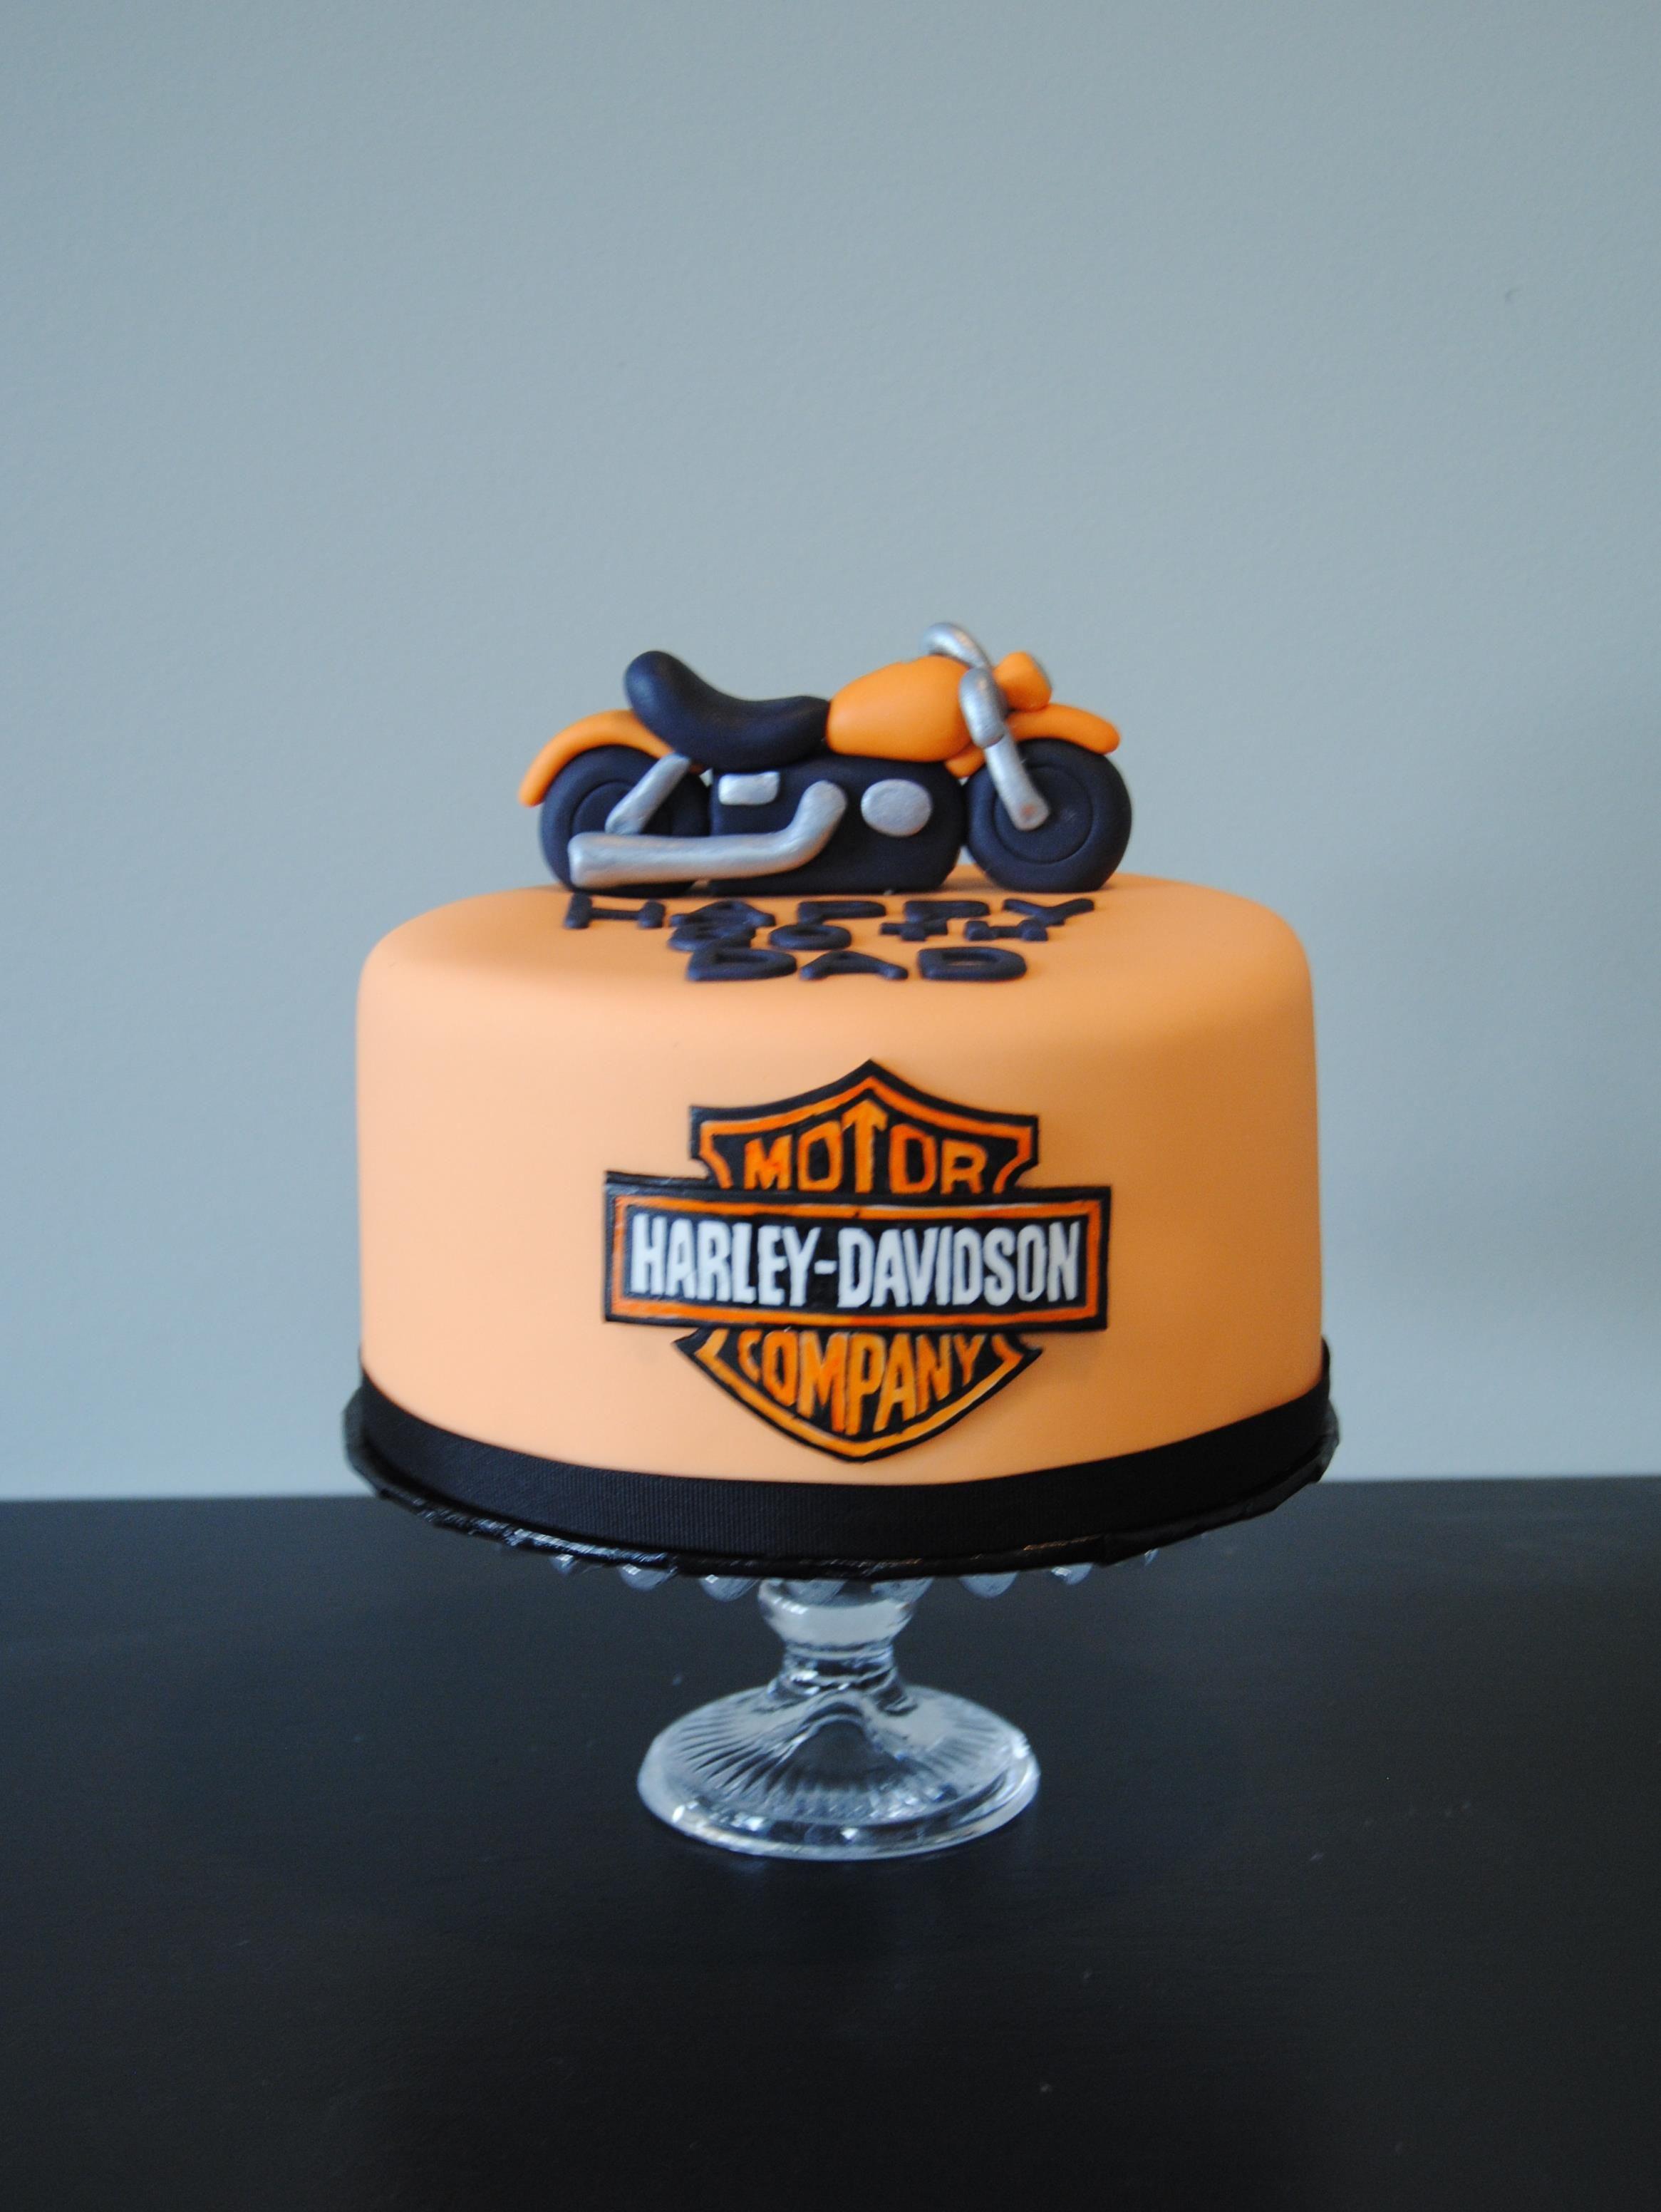 Harley Davidson Birthday Cake From The Handmade Cake Company Cakes